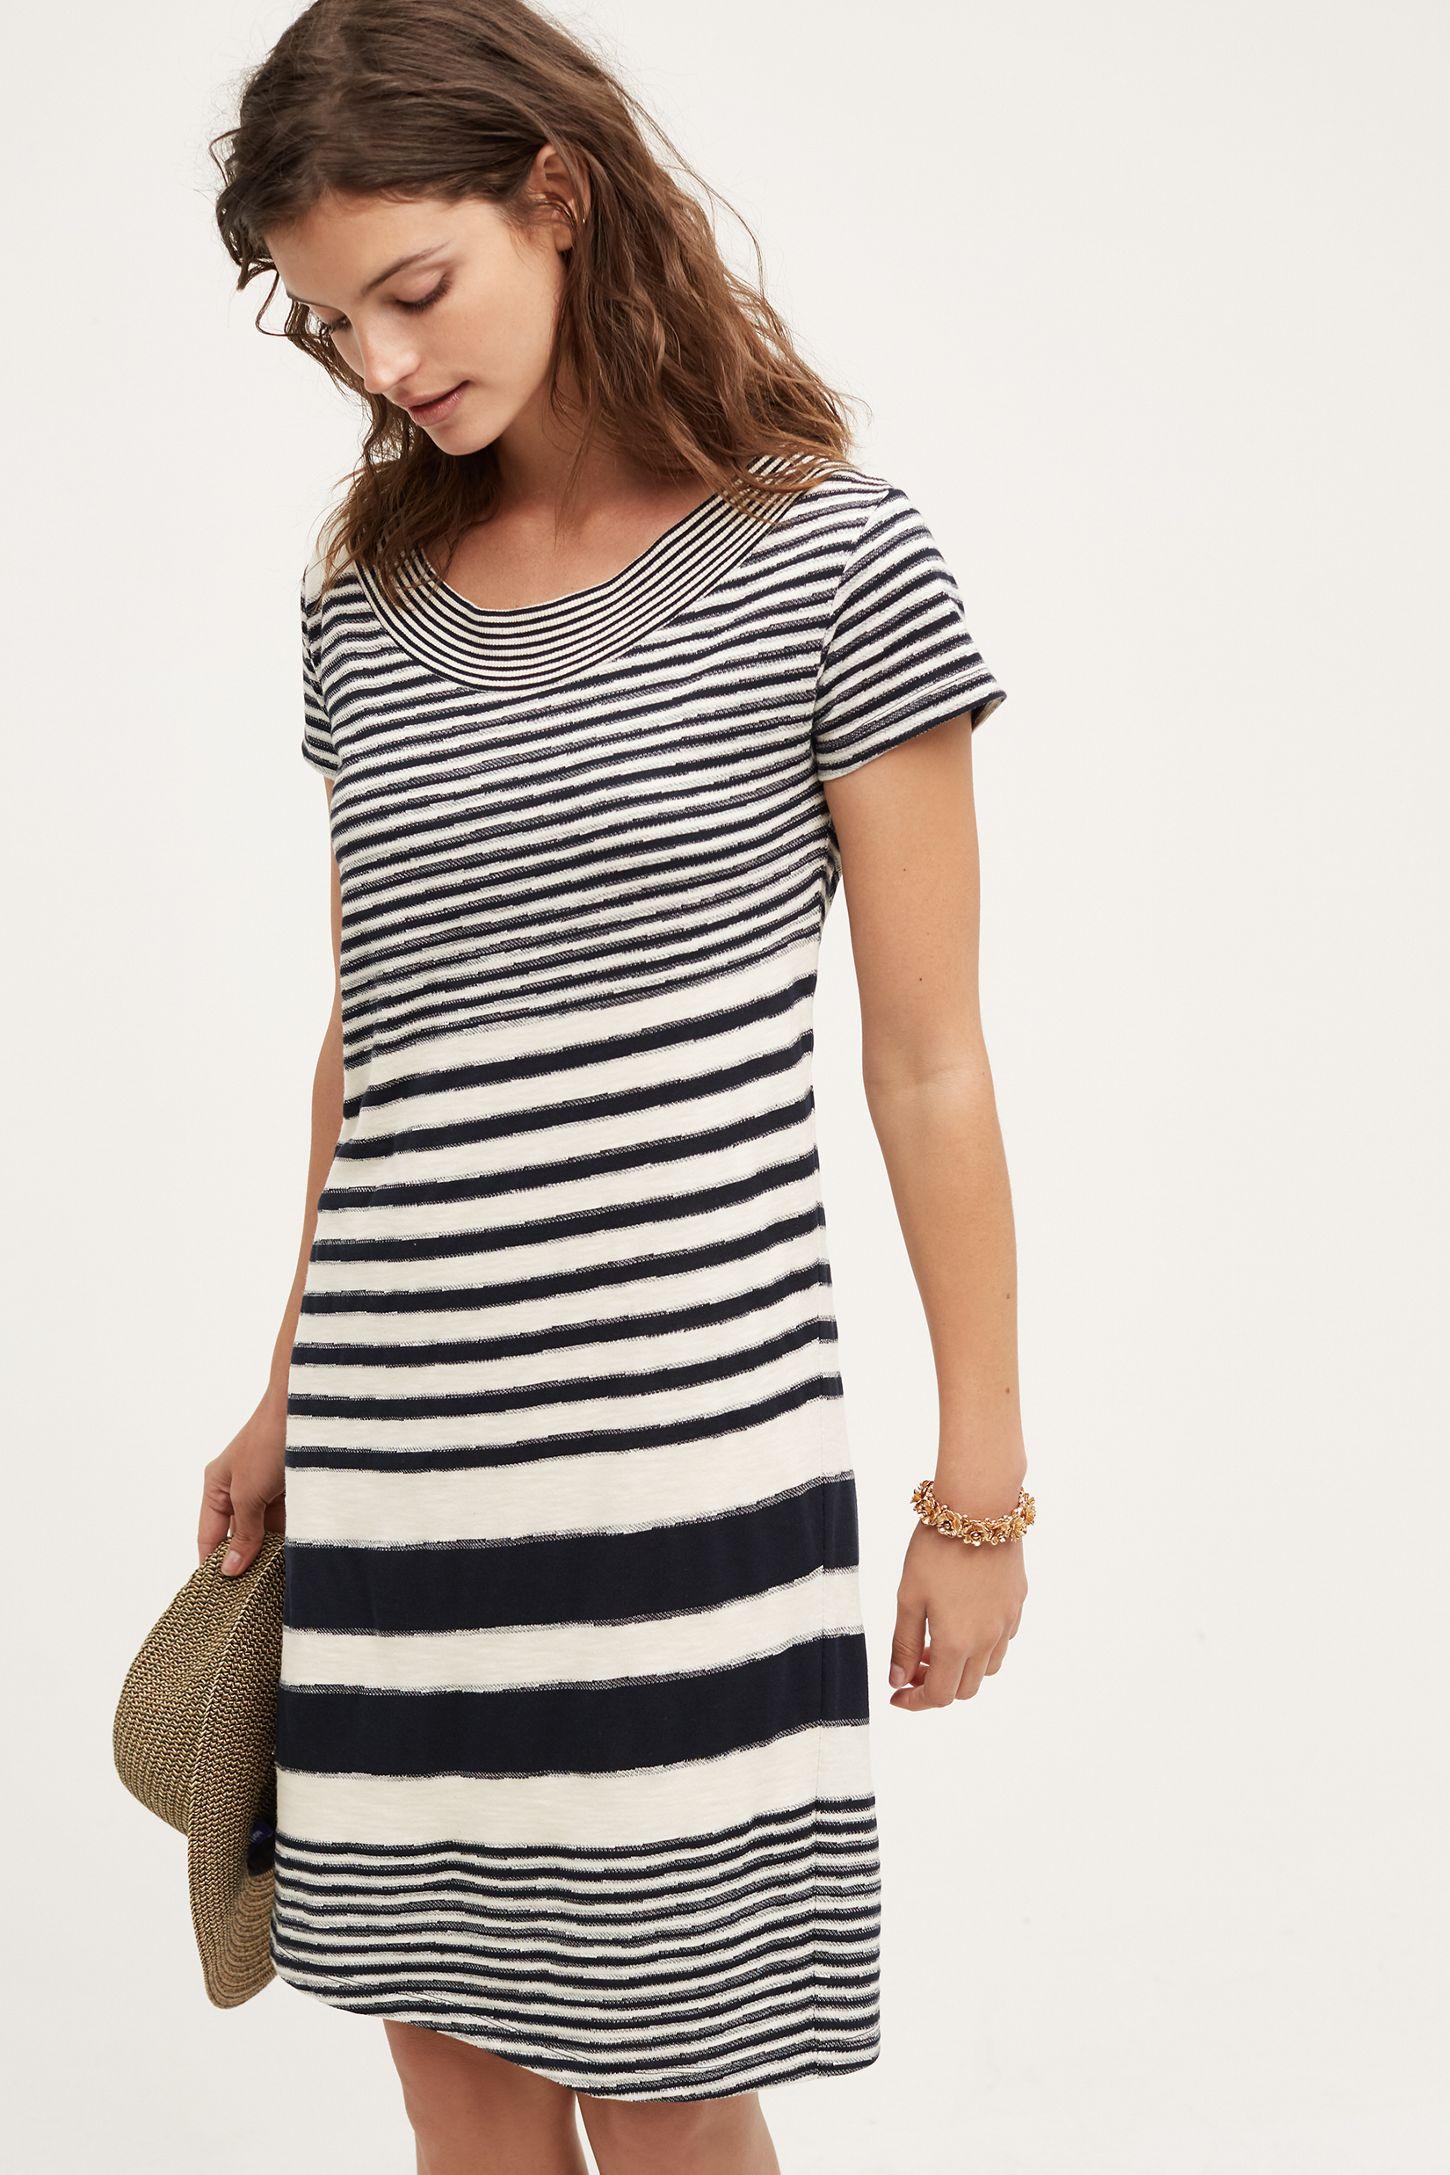 0976cbd7ce4 Haven Striped Dress   Anthropologie